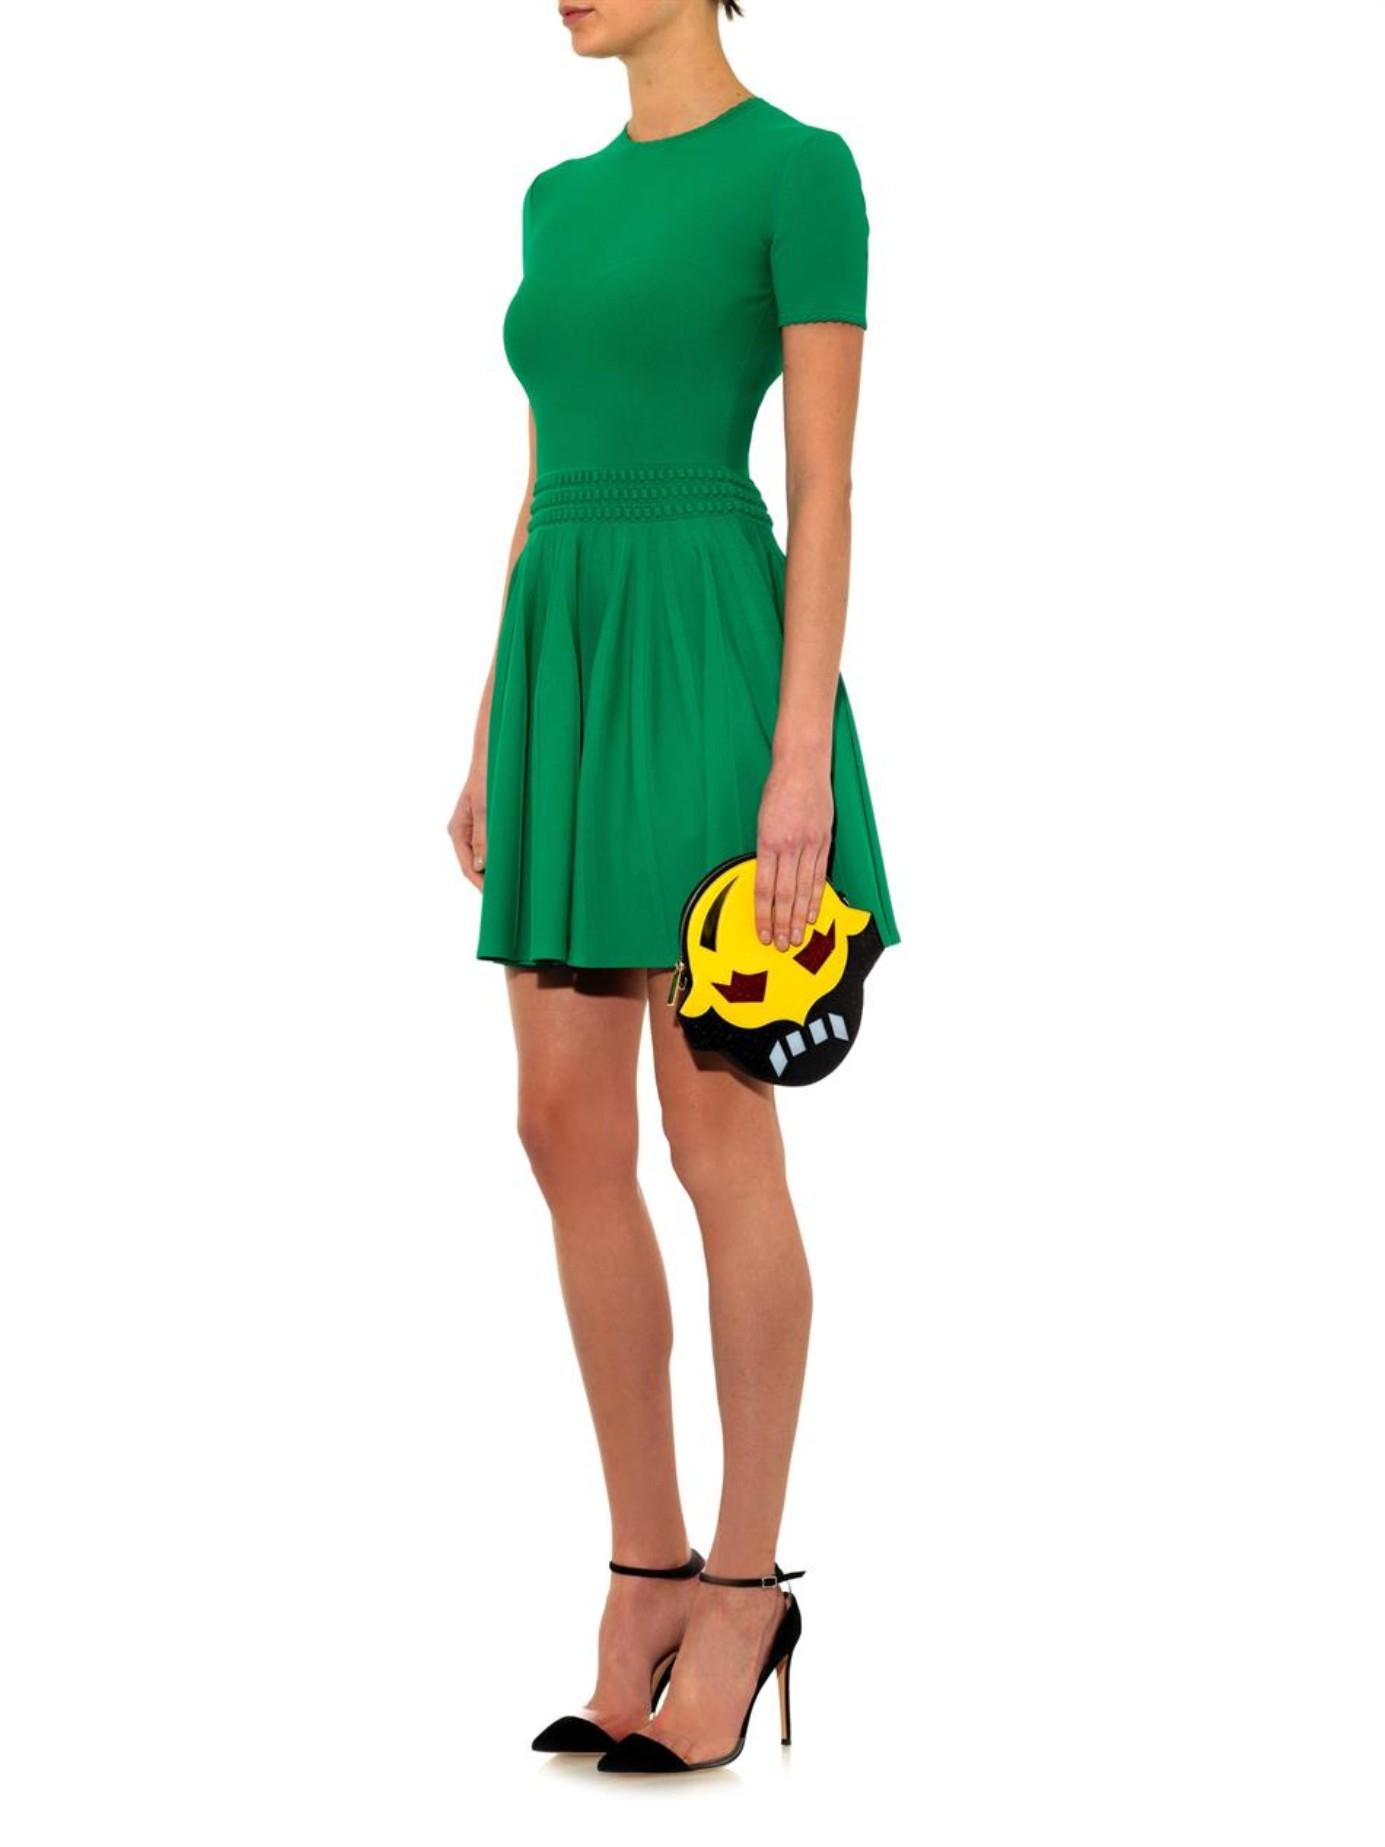 Lyst - Alexander Mcqueen Stretch-knit Dress in Green